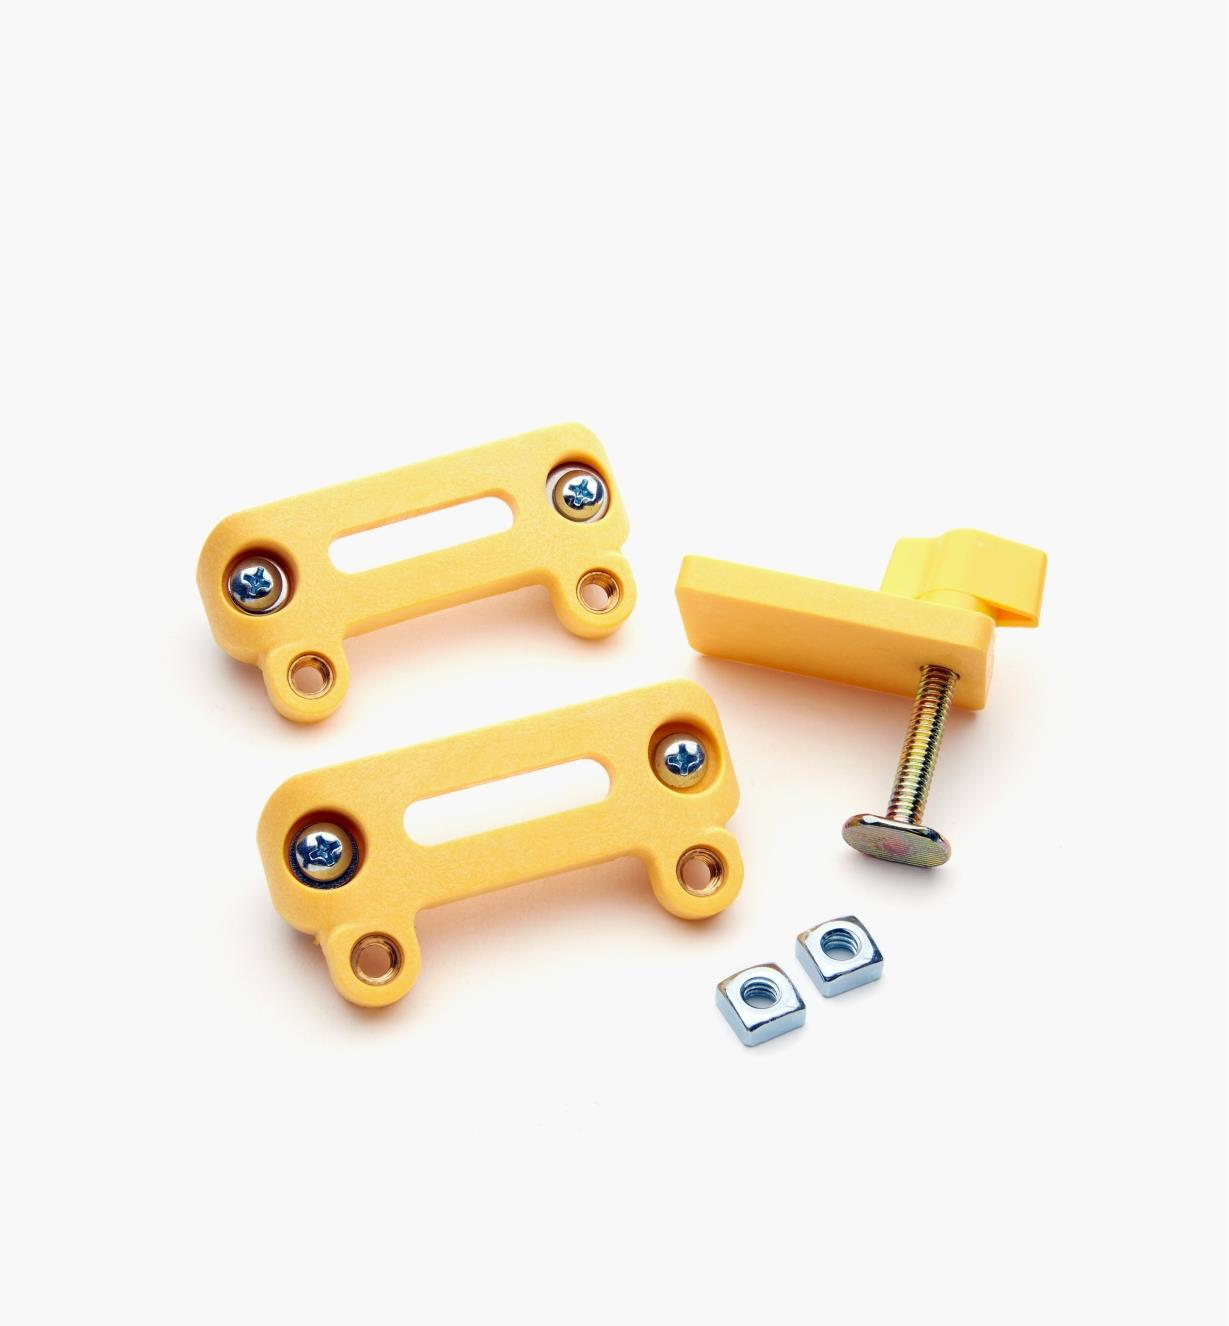 03J8013 - Handle Accessory Kit